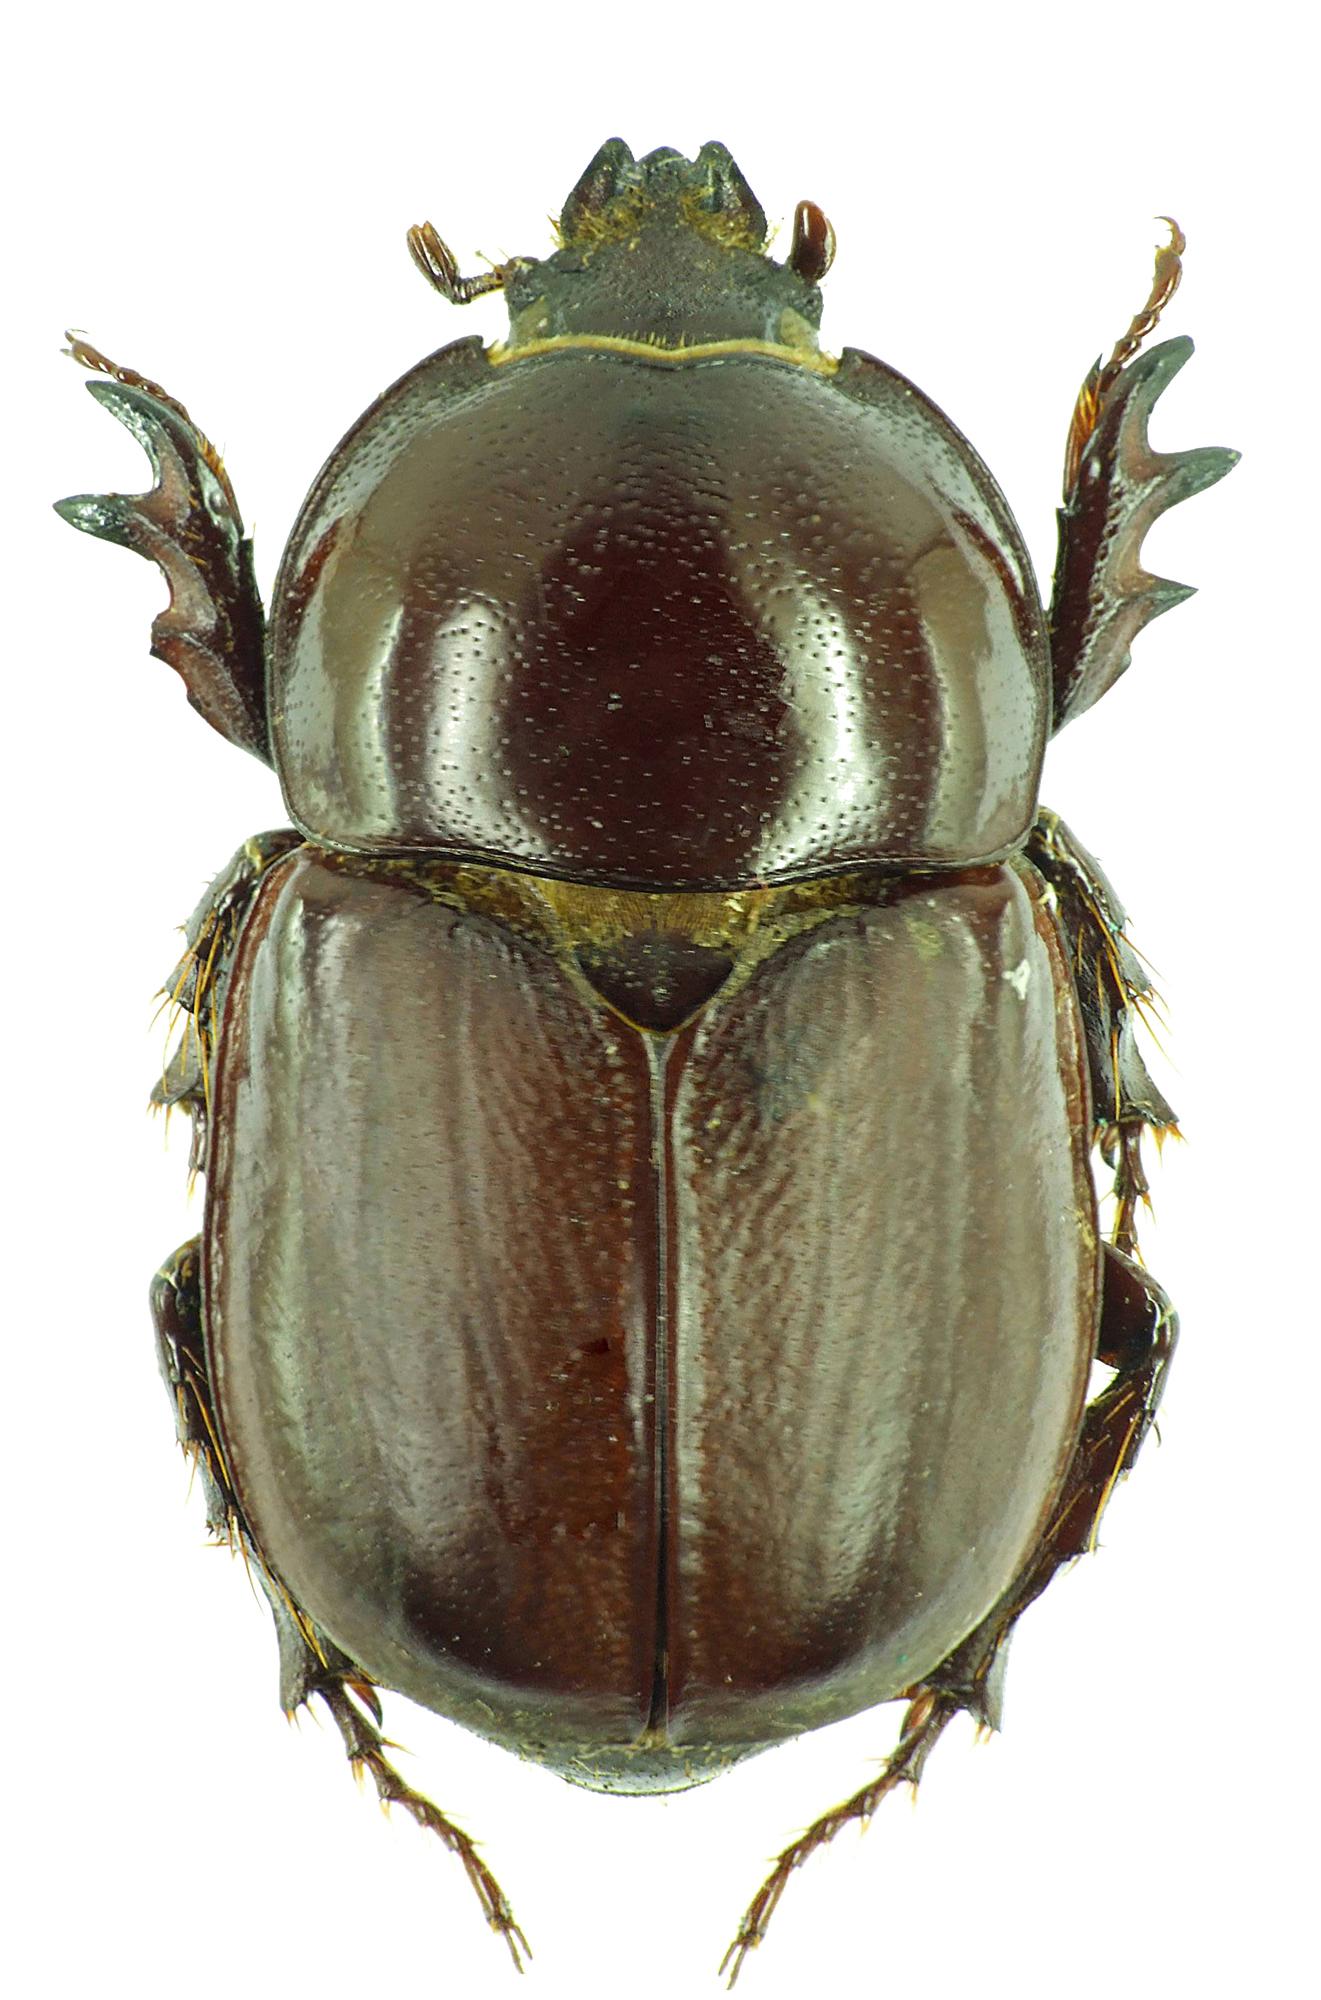 Diloboderus abderus 30349cz53.jpg